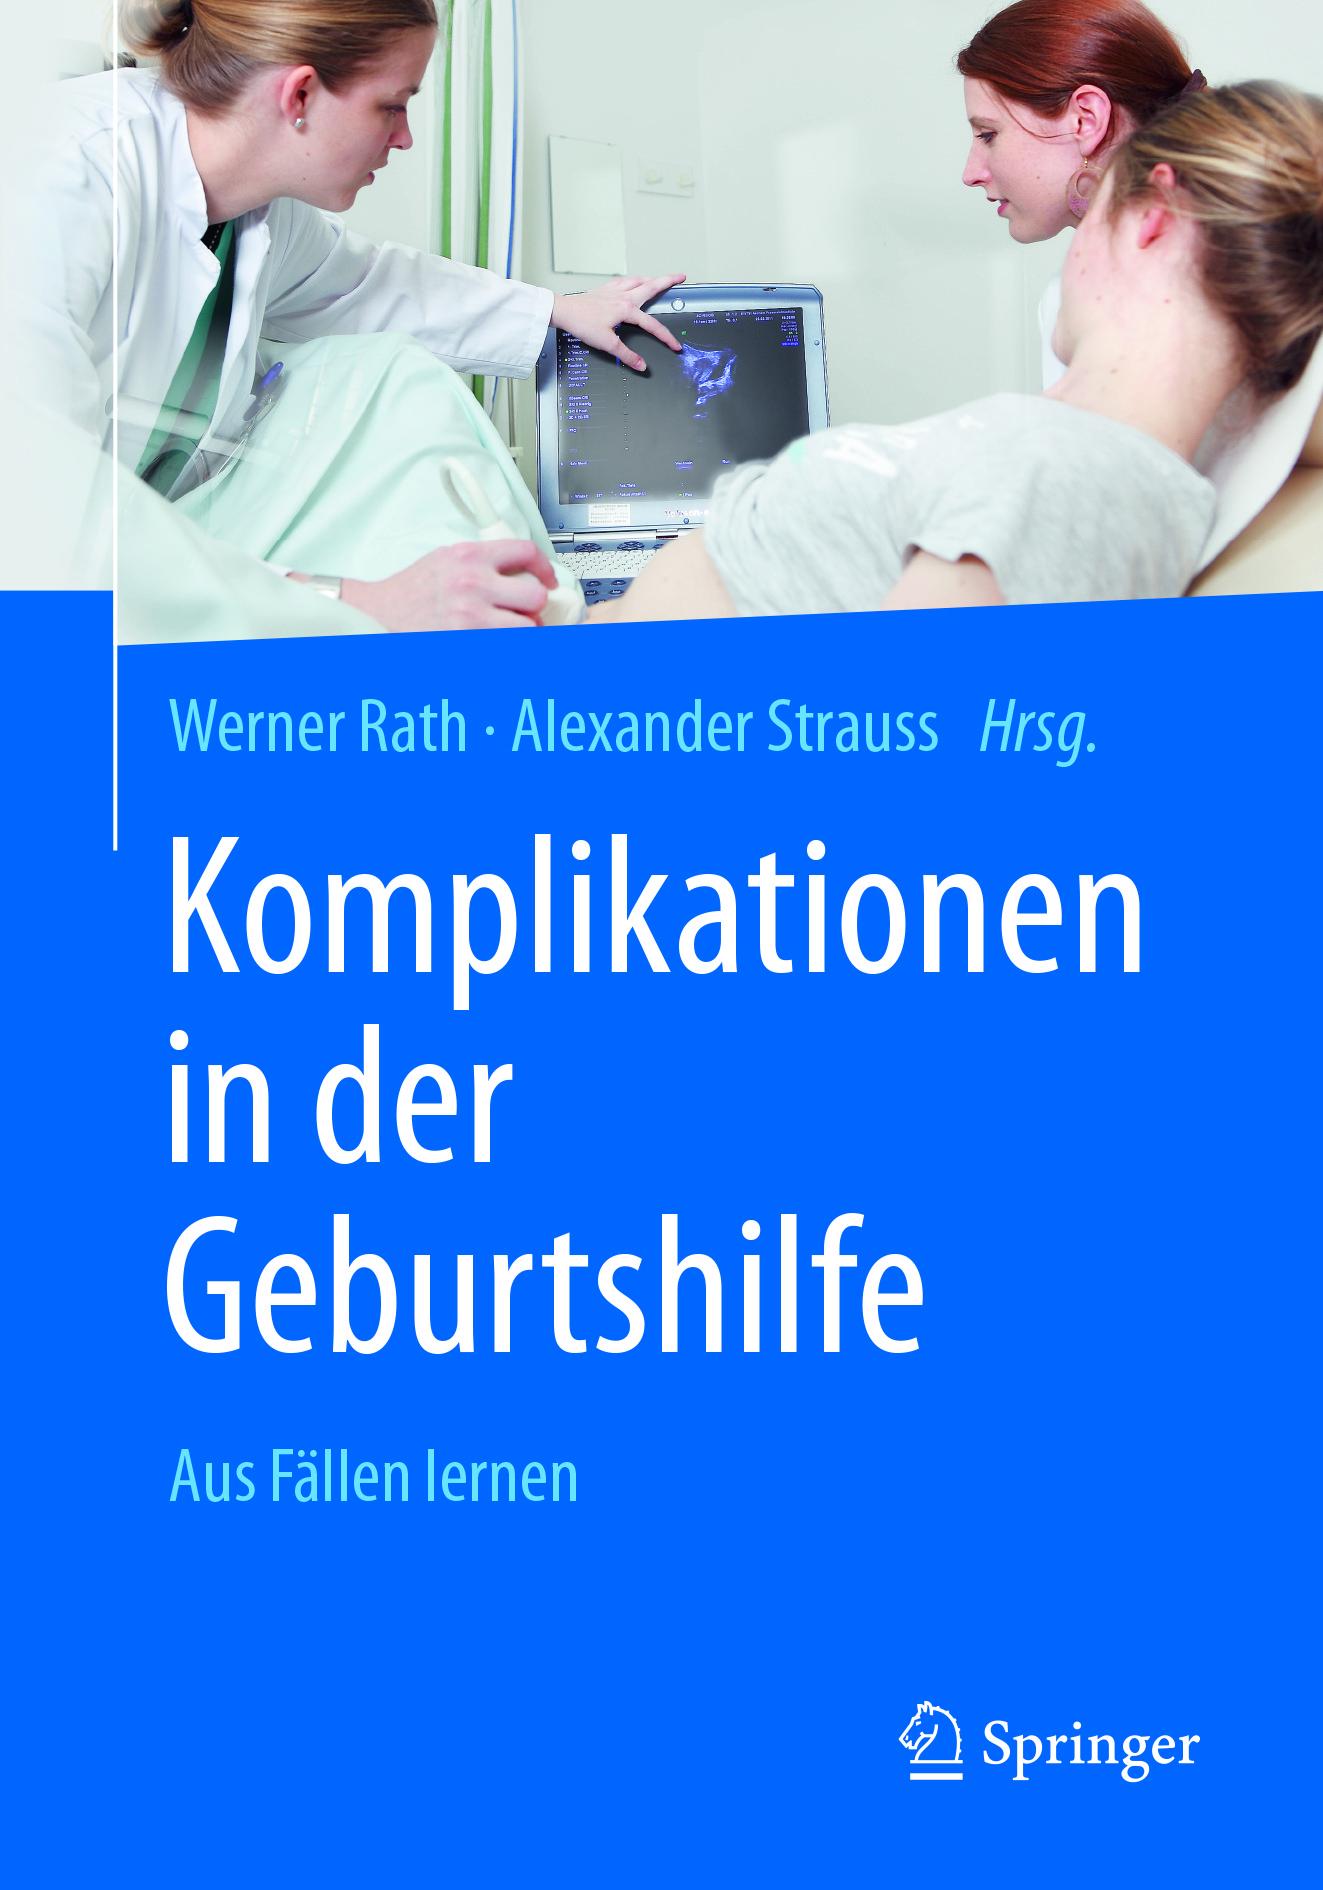 Rath, Werner - Komplikationen in der Geburtshilfe, ebook